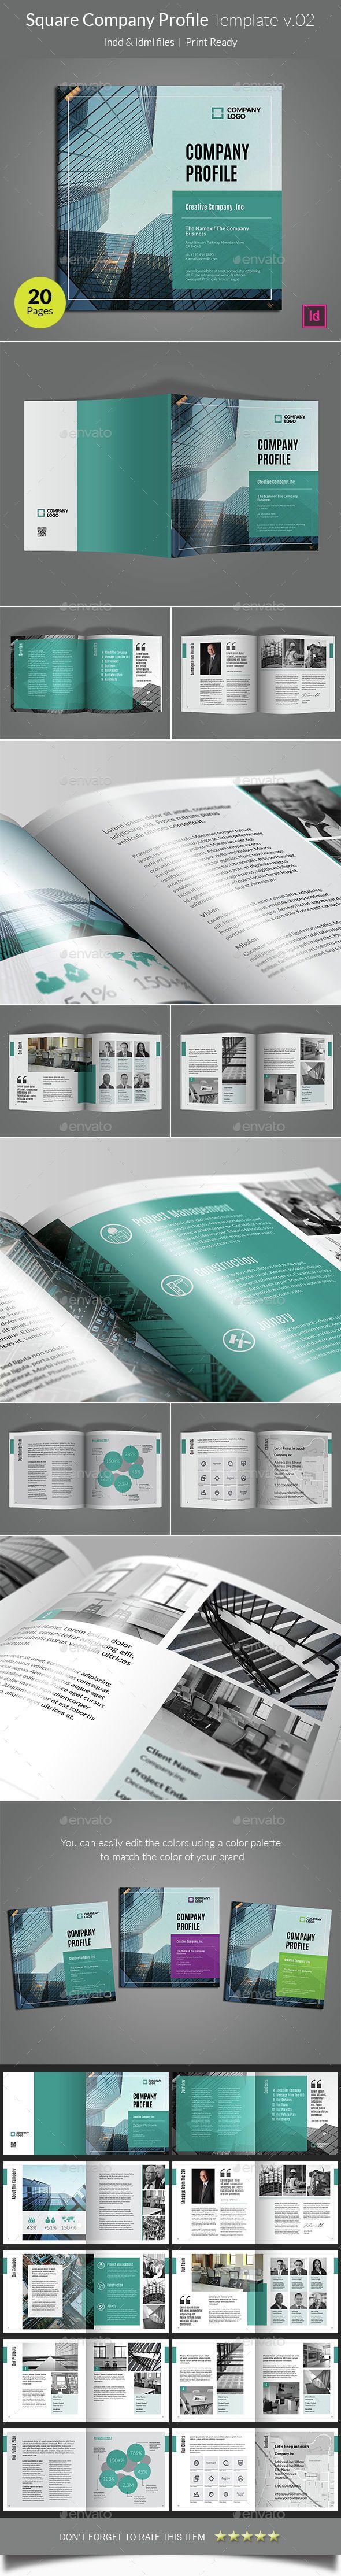 Company Profile Template V02 | Company profile, Template and Profile